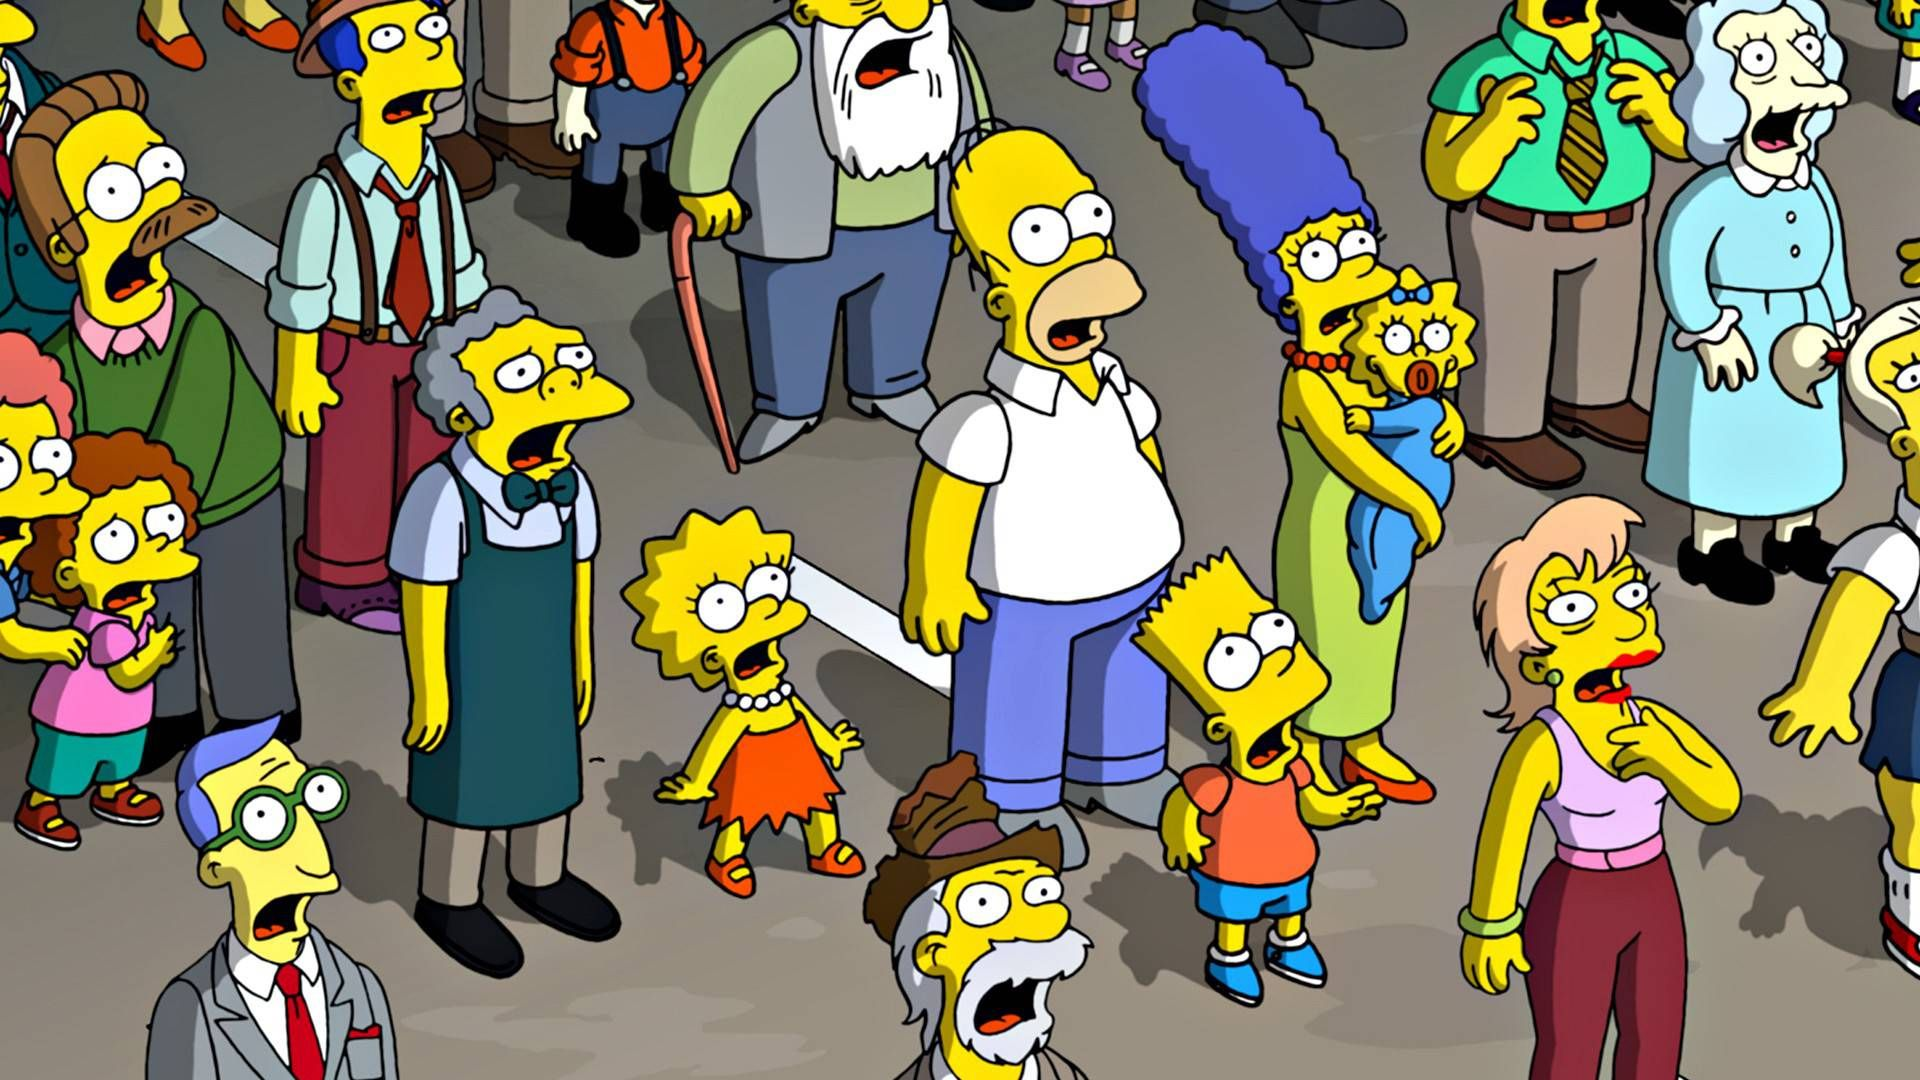 The Simpsons Apple Wallpaper Desktop #1822 Wallpaper .